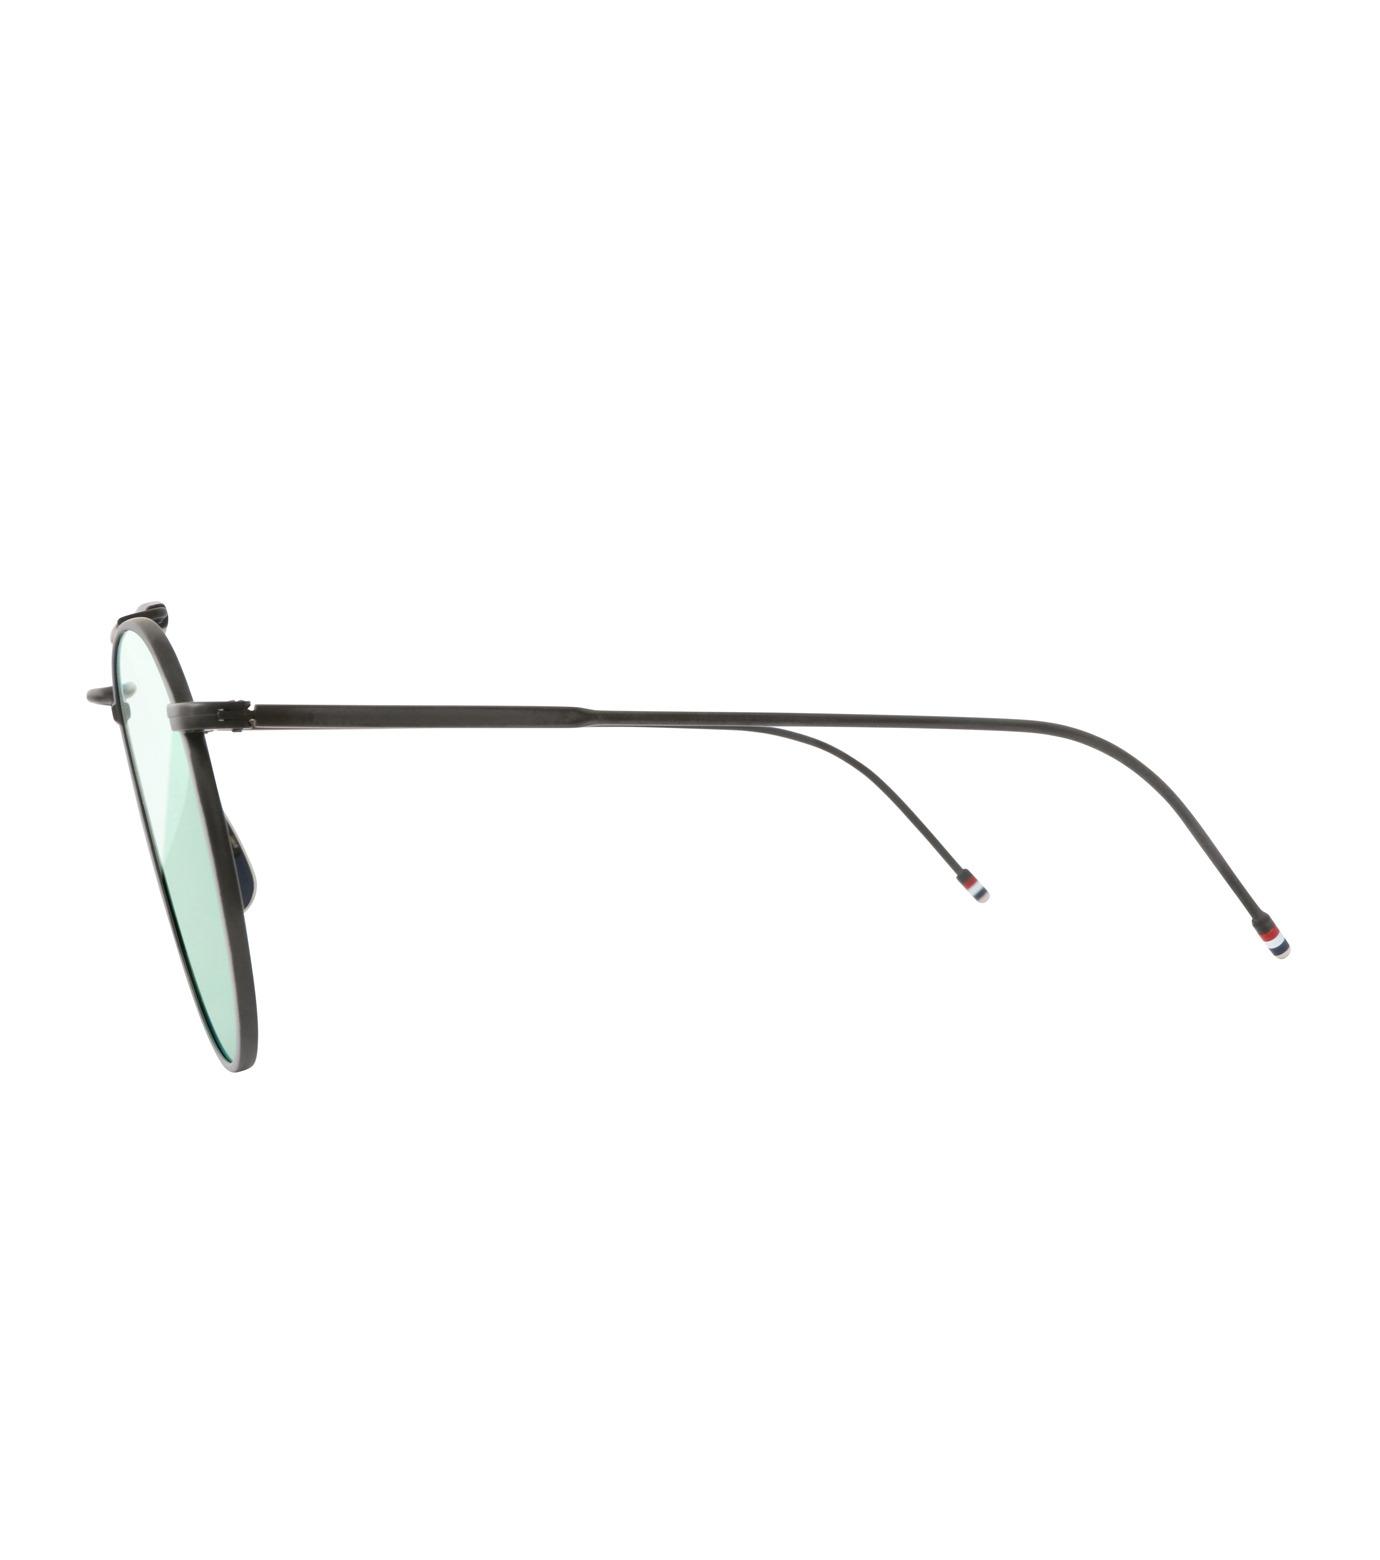 Thom Browne Eye Wear(トム・ブラウン・アイウェア)のTeardrop Silver-BLACK(アイウェア/eyewear)-TB-015-LTD-13 拡大詳細画像2